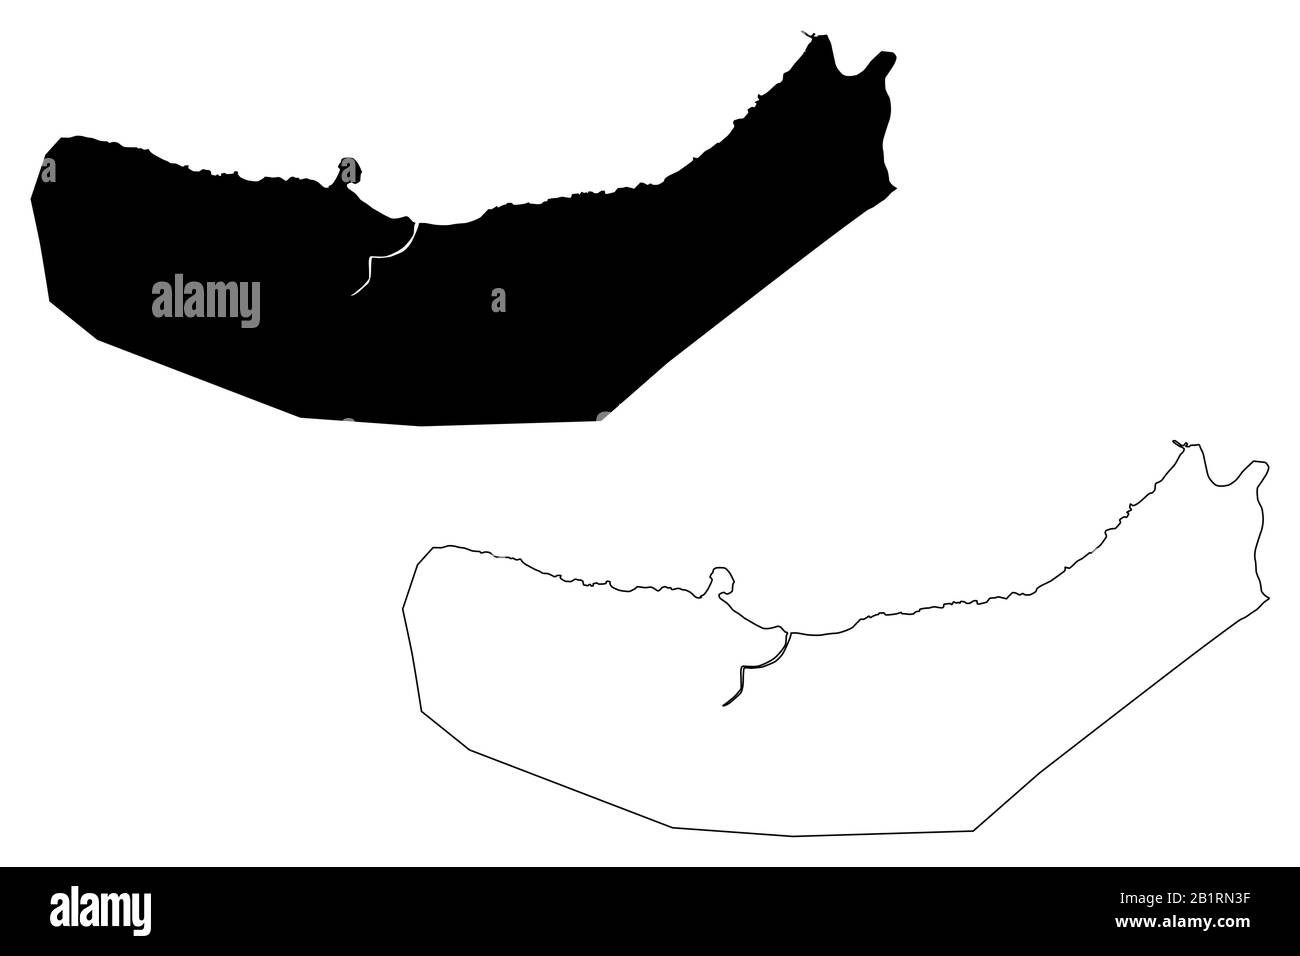 Malaita Guadalcanal New Zealand Terre de Quir SOLOMON ISLANDS MALLET 1683 map